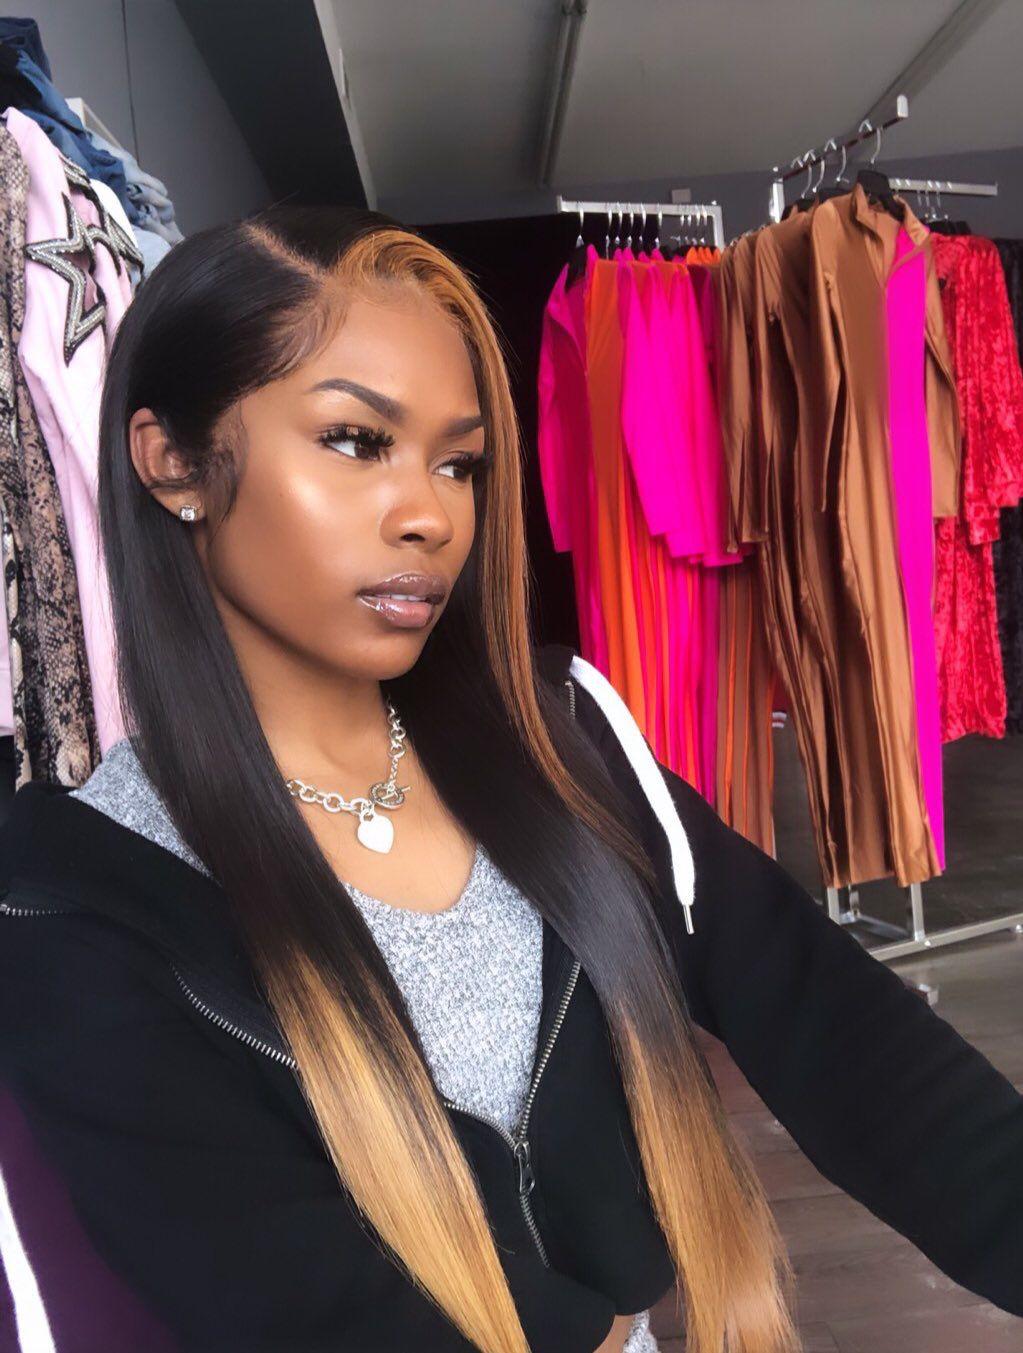 ᴘɪɴ ᴏɴʟʏ1ɴᴇᴋᴀɪʟɪ 💚 Wig hairstyles, Front hair styles